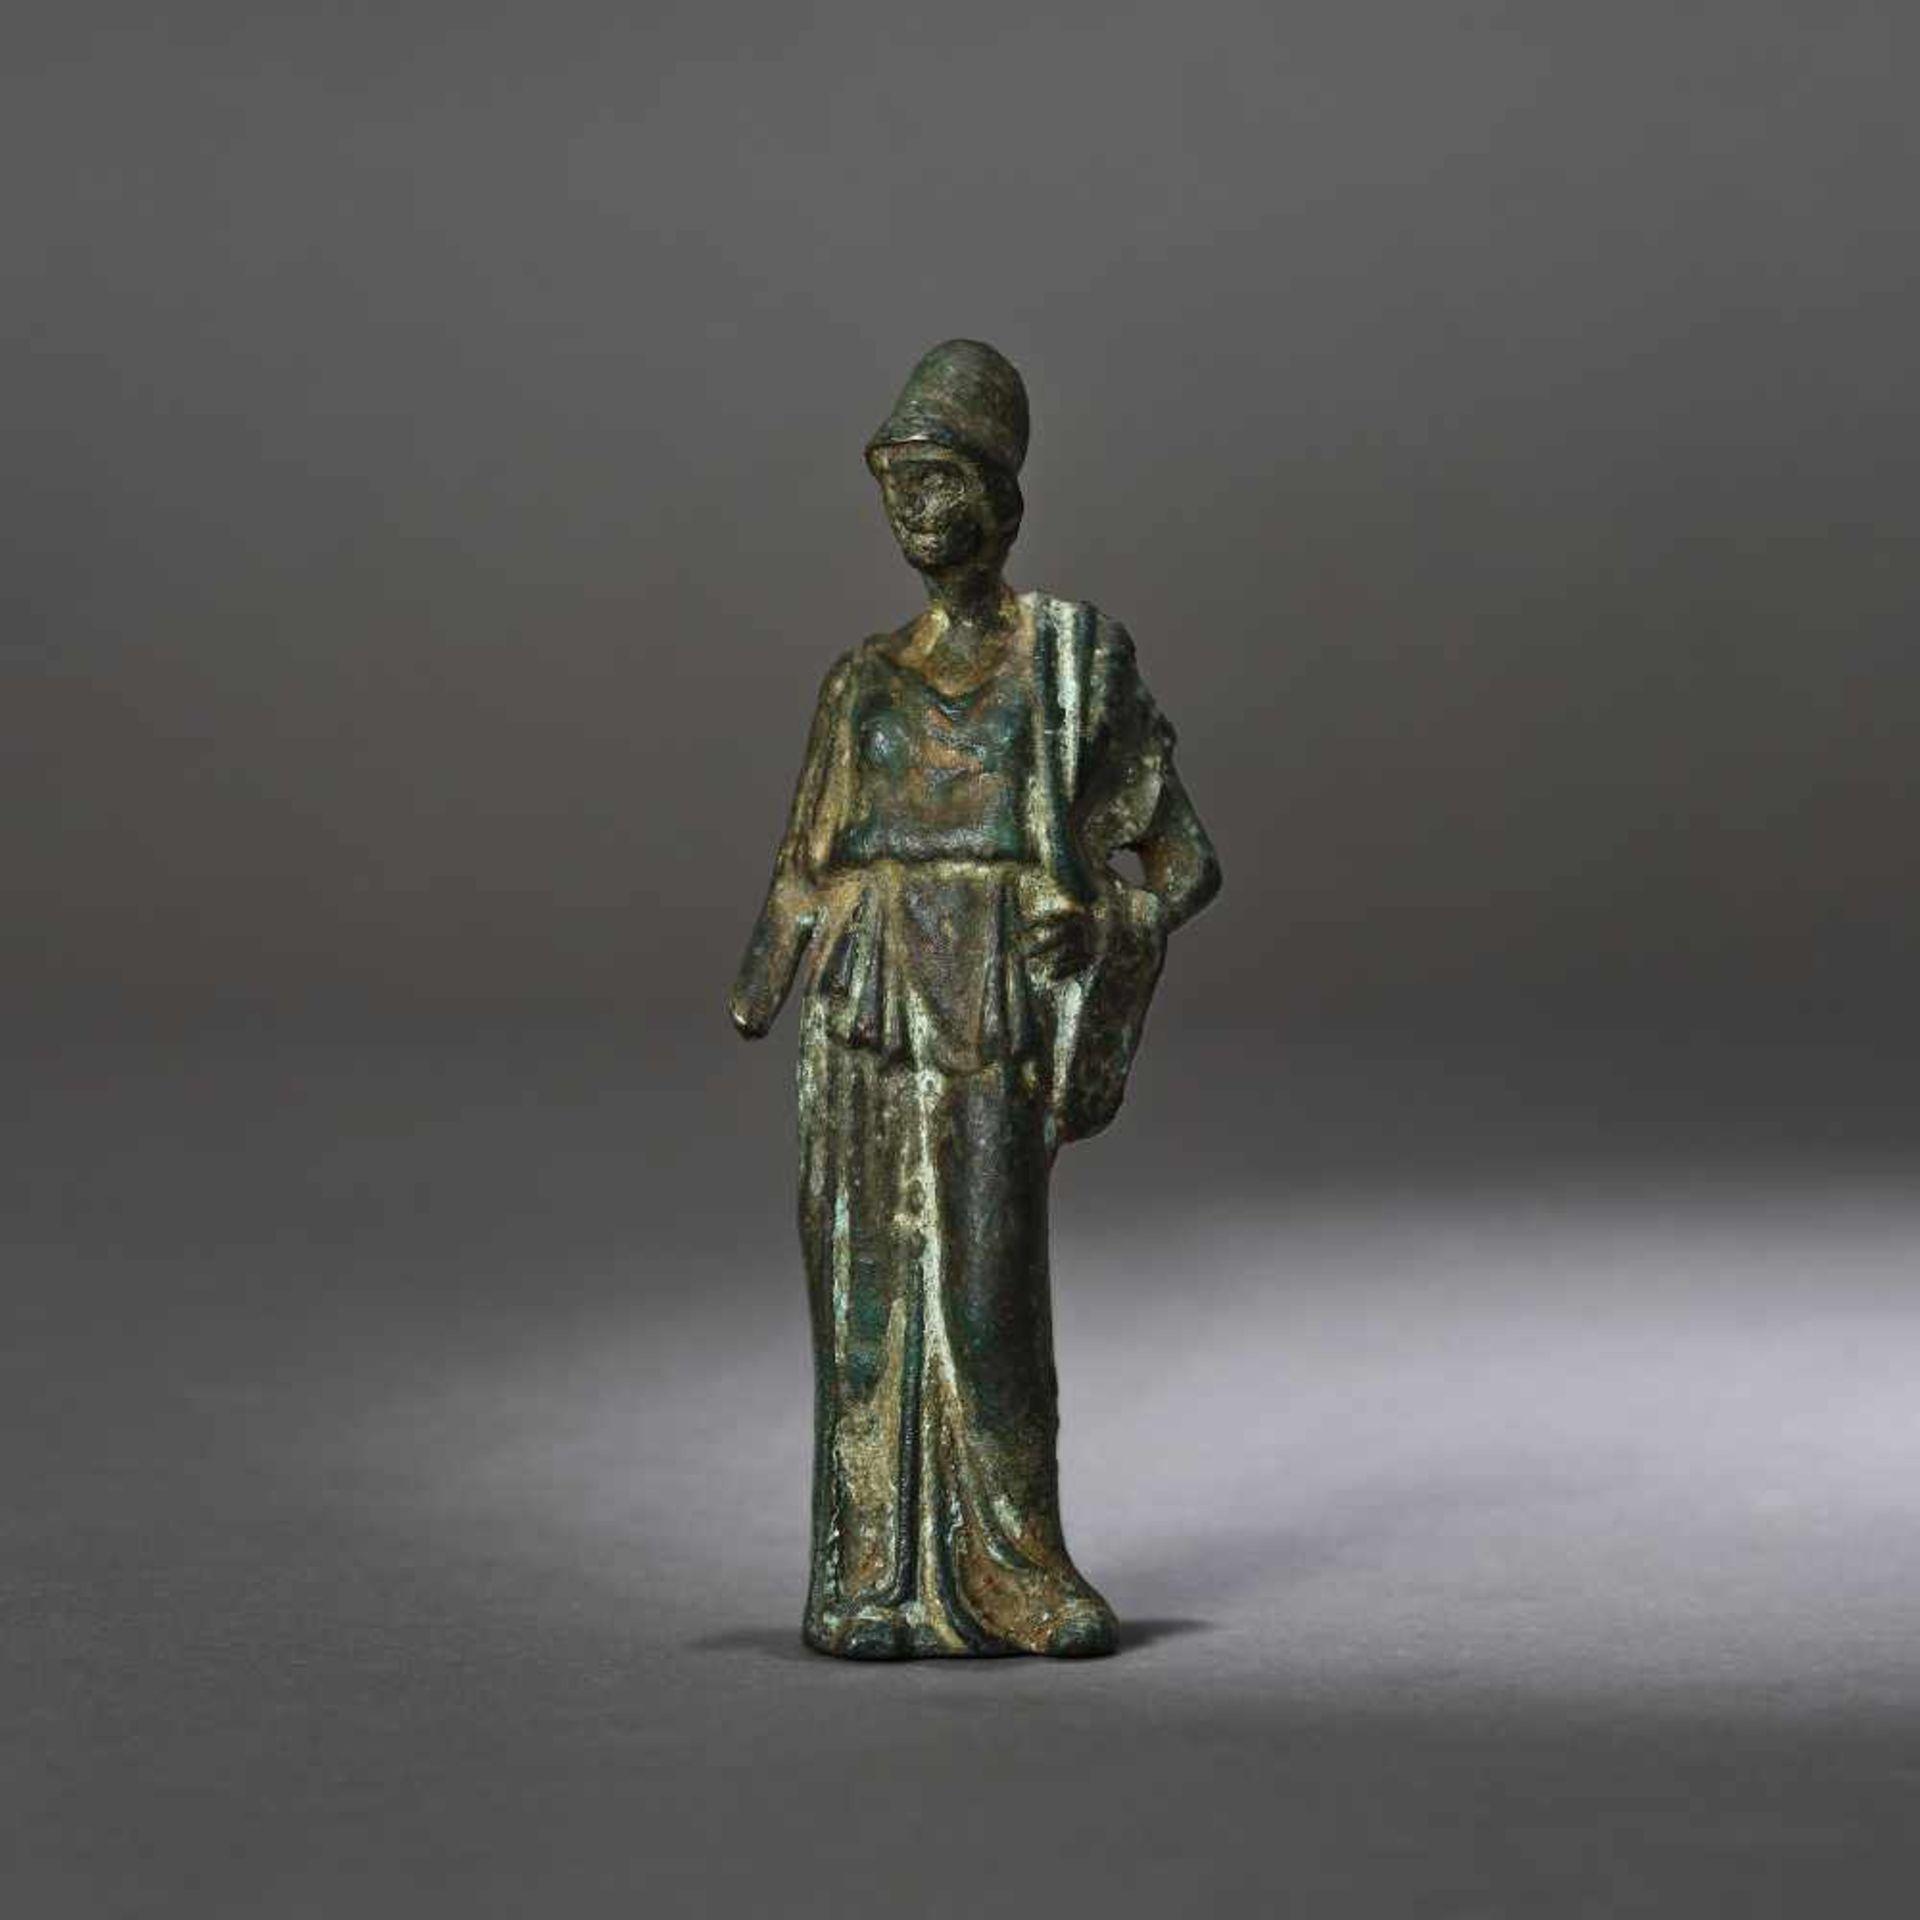 Bronze statuette depicting Athena, the goddess of wisdom, 1st century B.C.